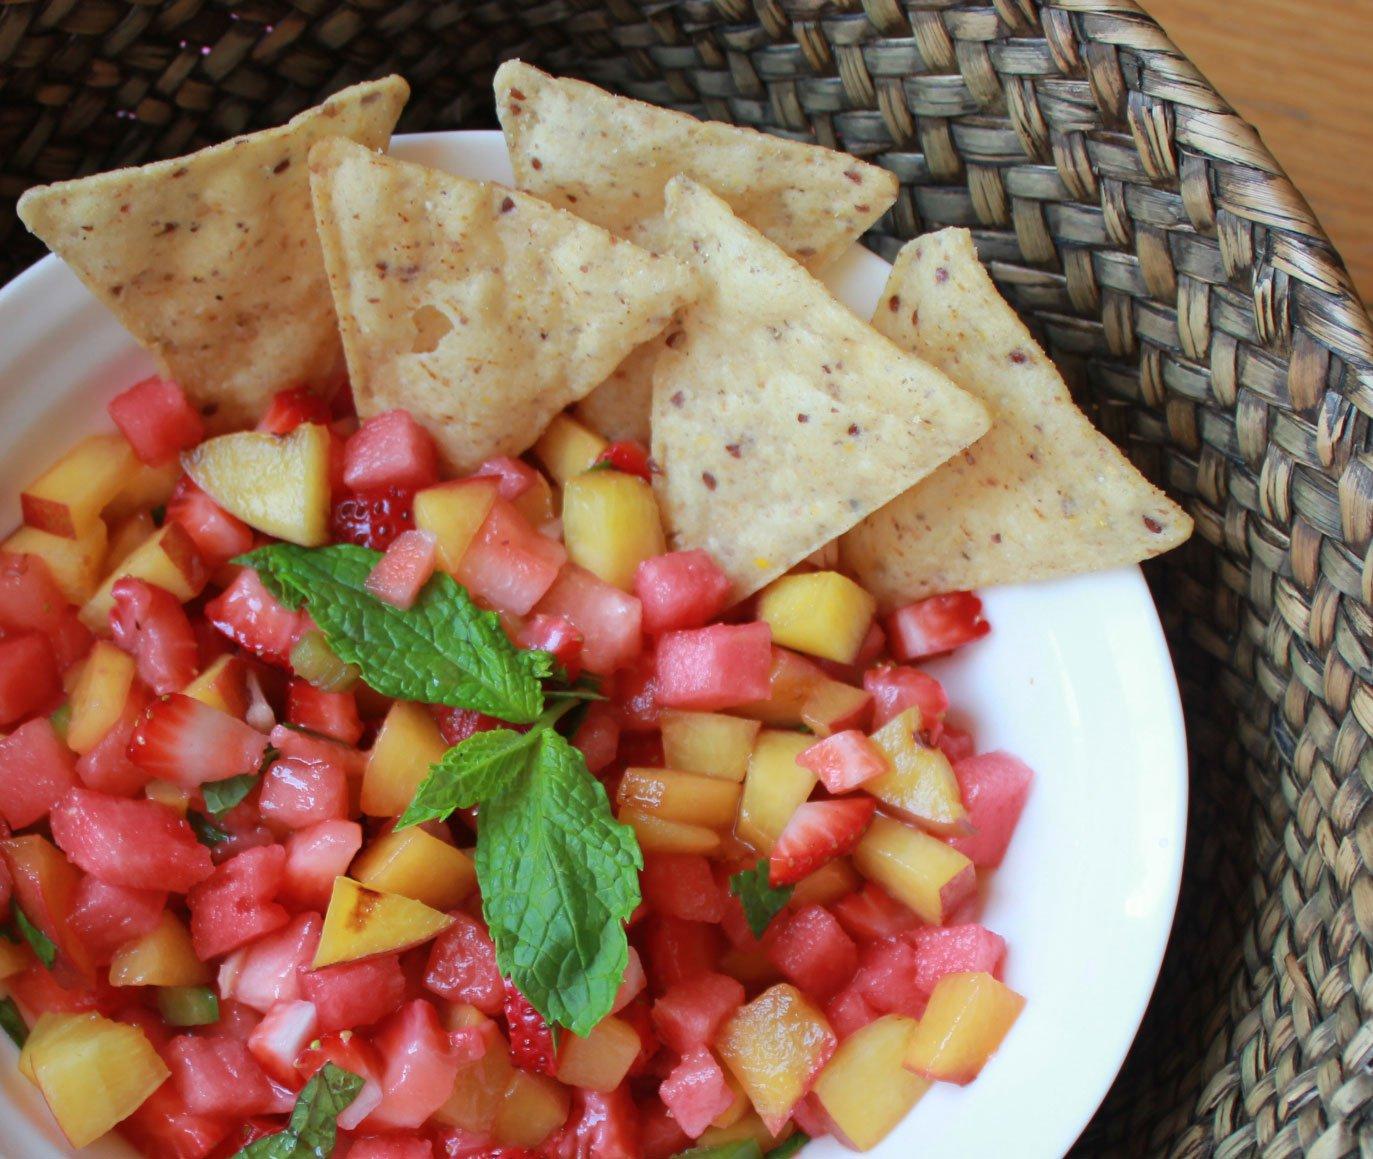 Wanda grilled-peach,-watermelon-a